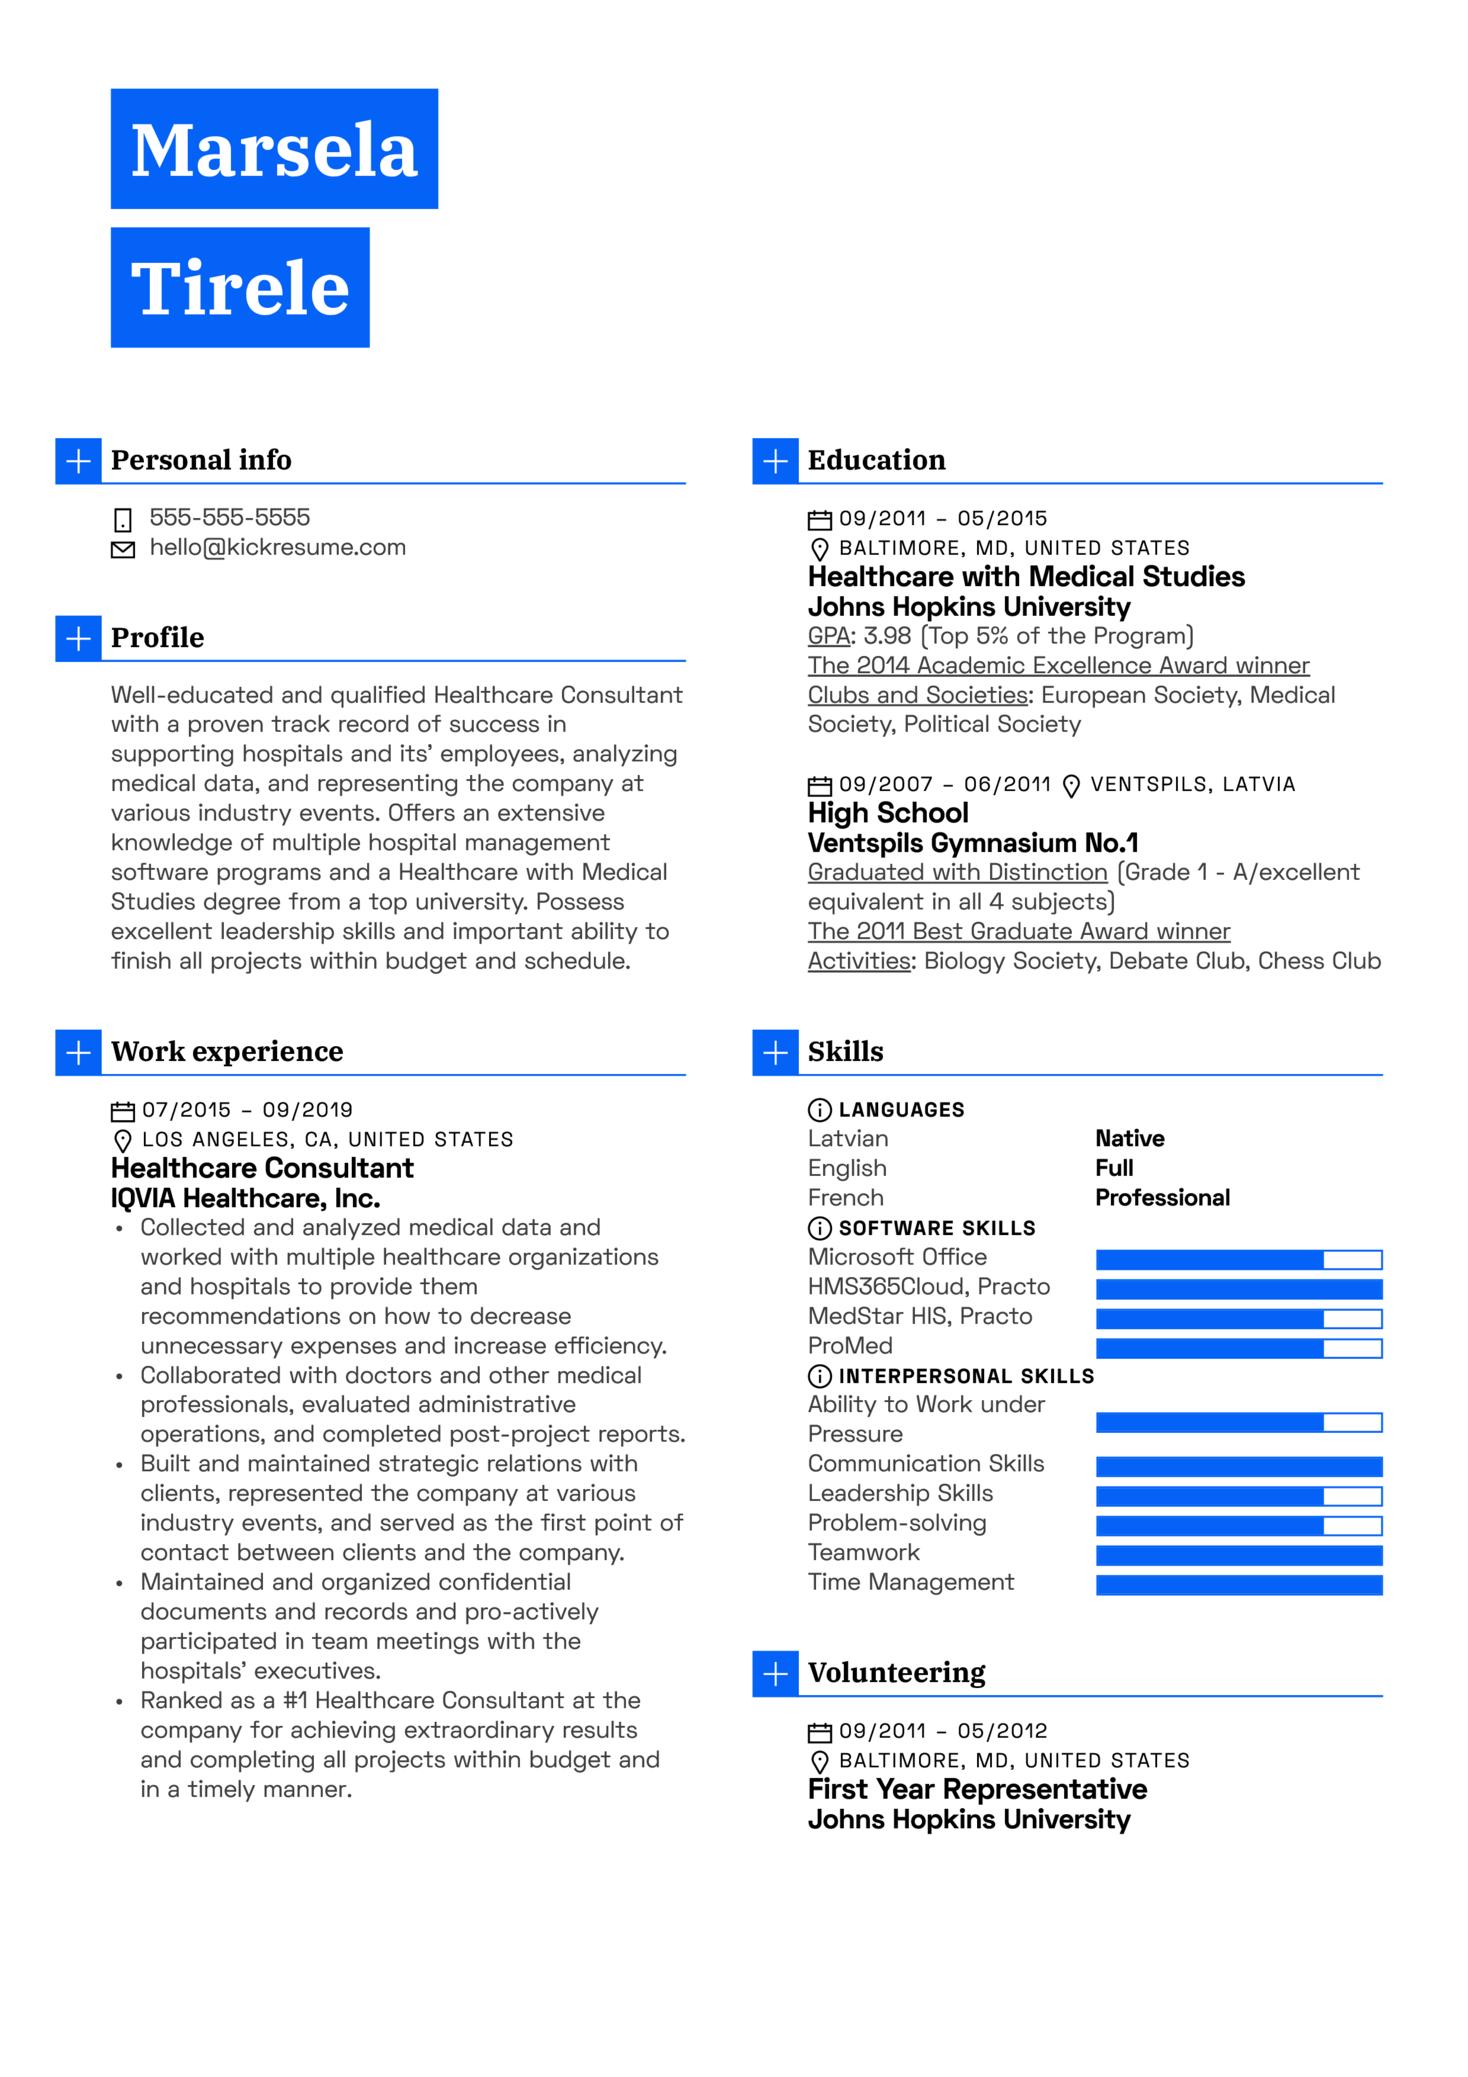 Healthcare Consultant Resume Example (parte 1)